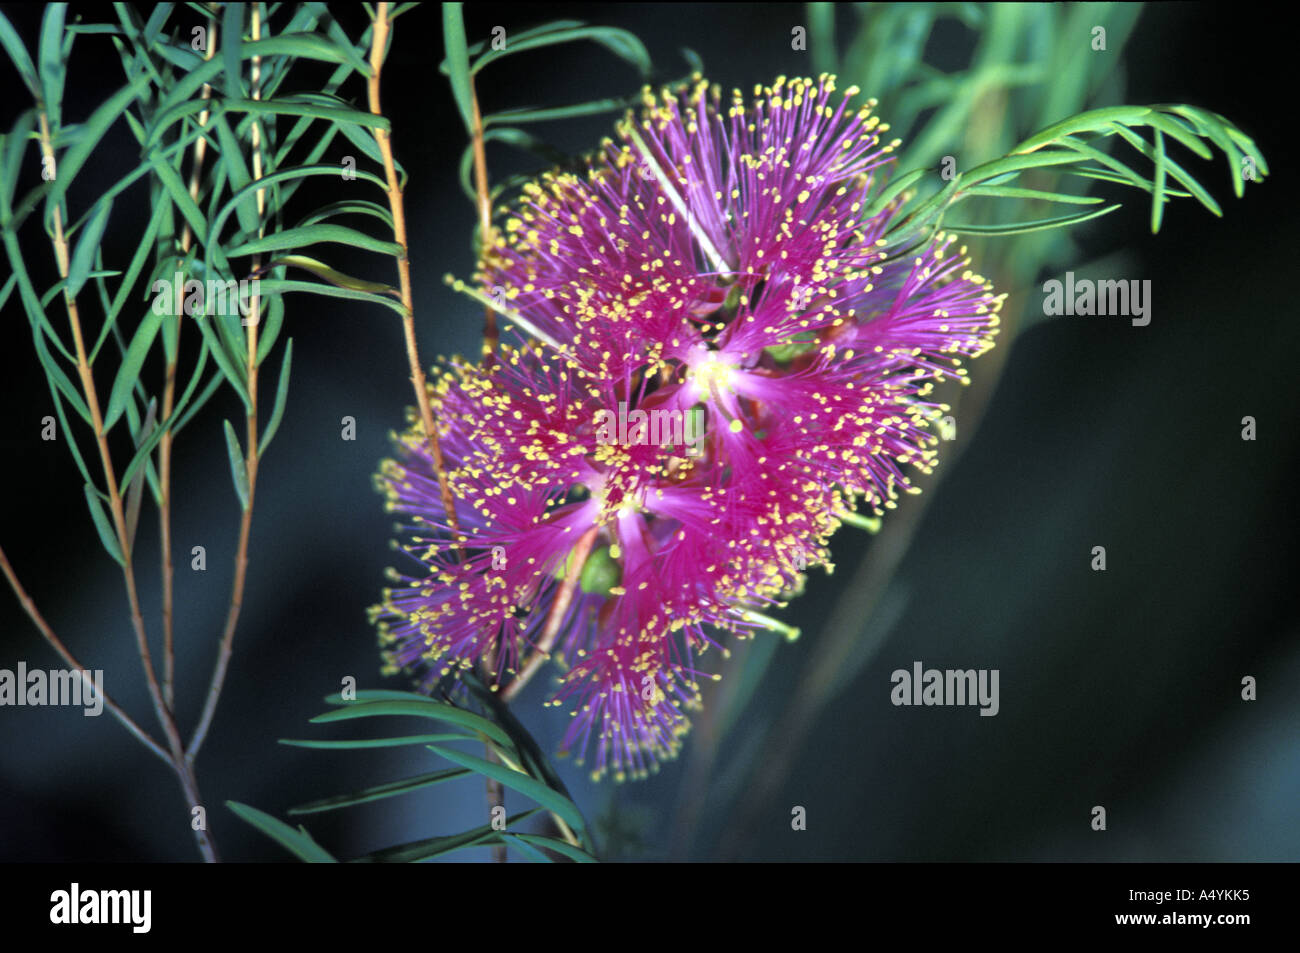 Blossom many strings - Stock Image